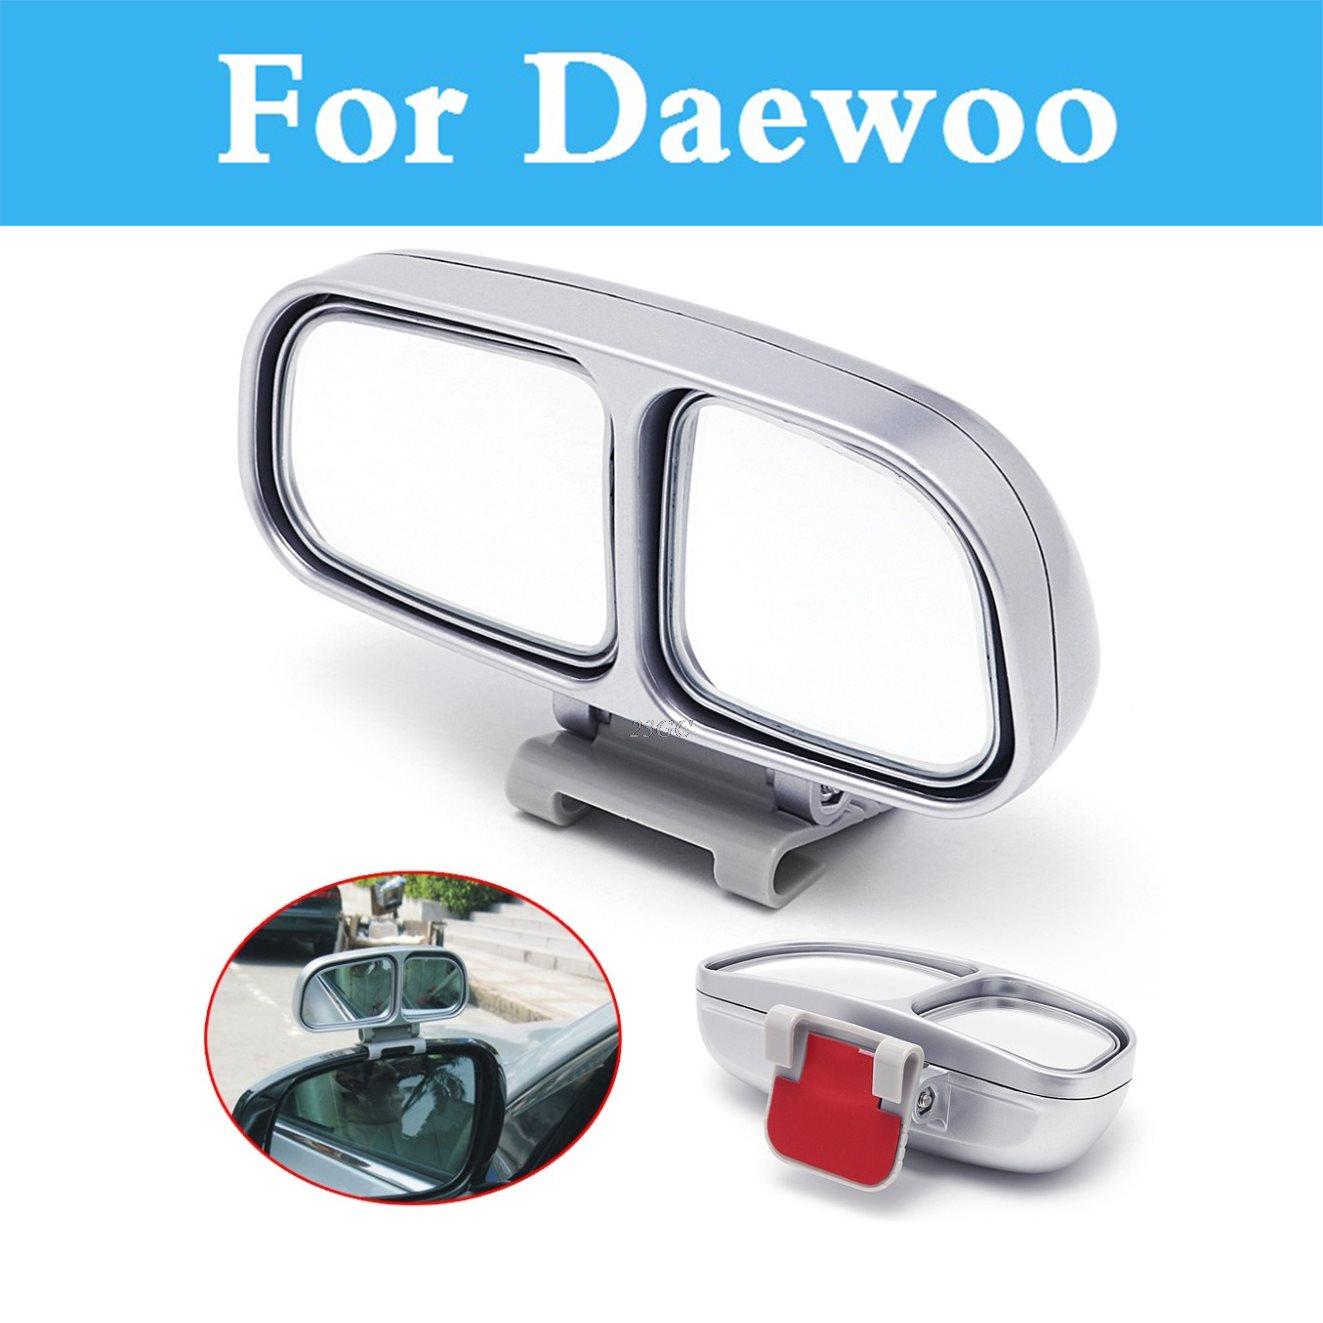 Adjustable Wide Angle Square Convex Blind Spot Mirror Car For Daewoo Winstorm Nubira Sens Tosca Matiz Nexia